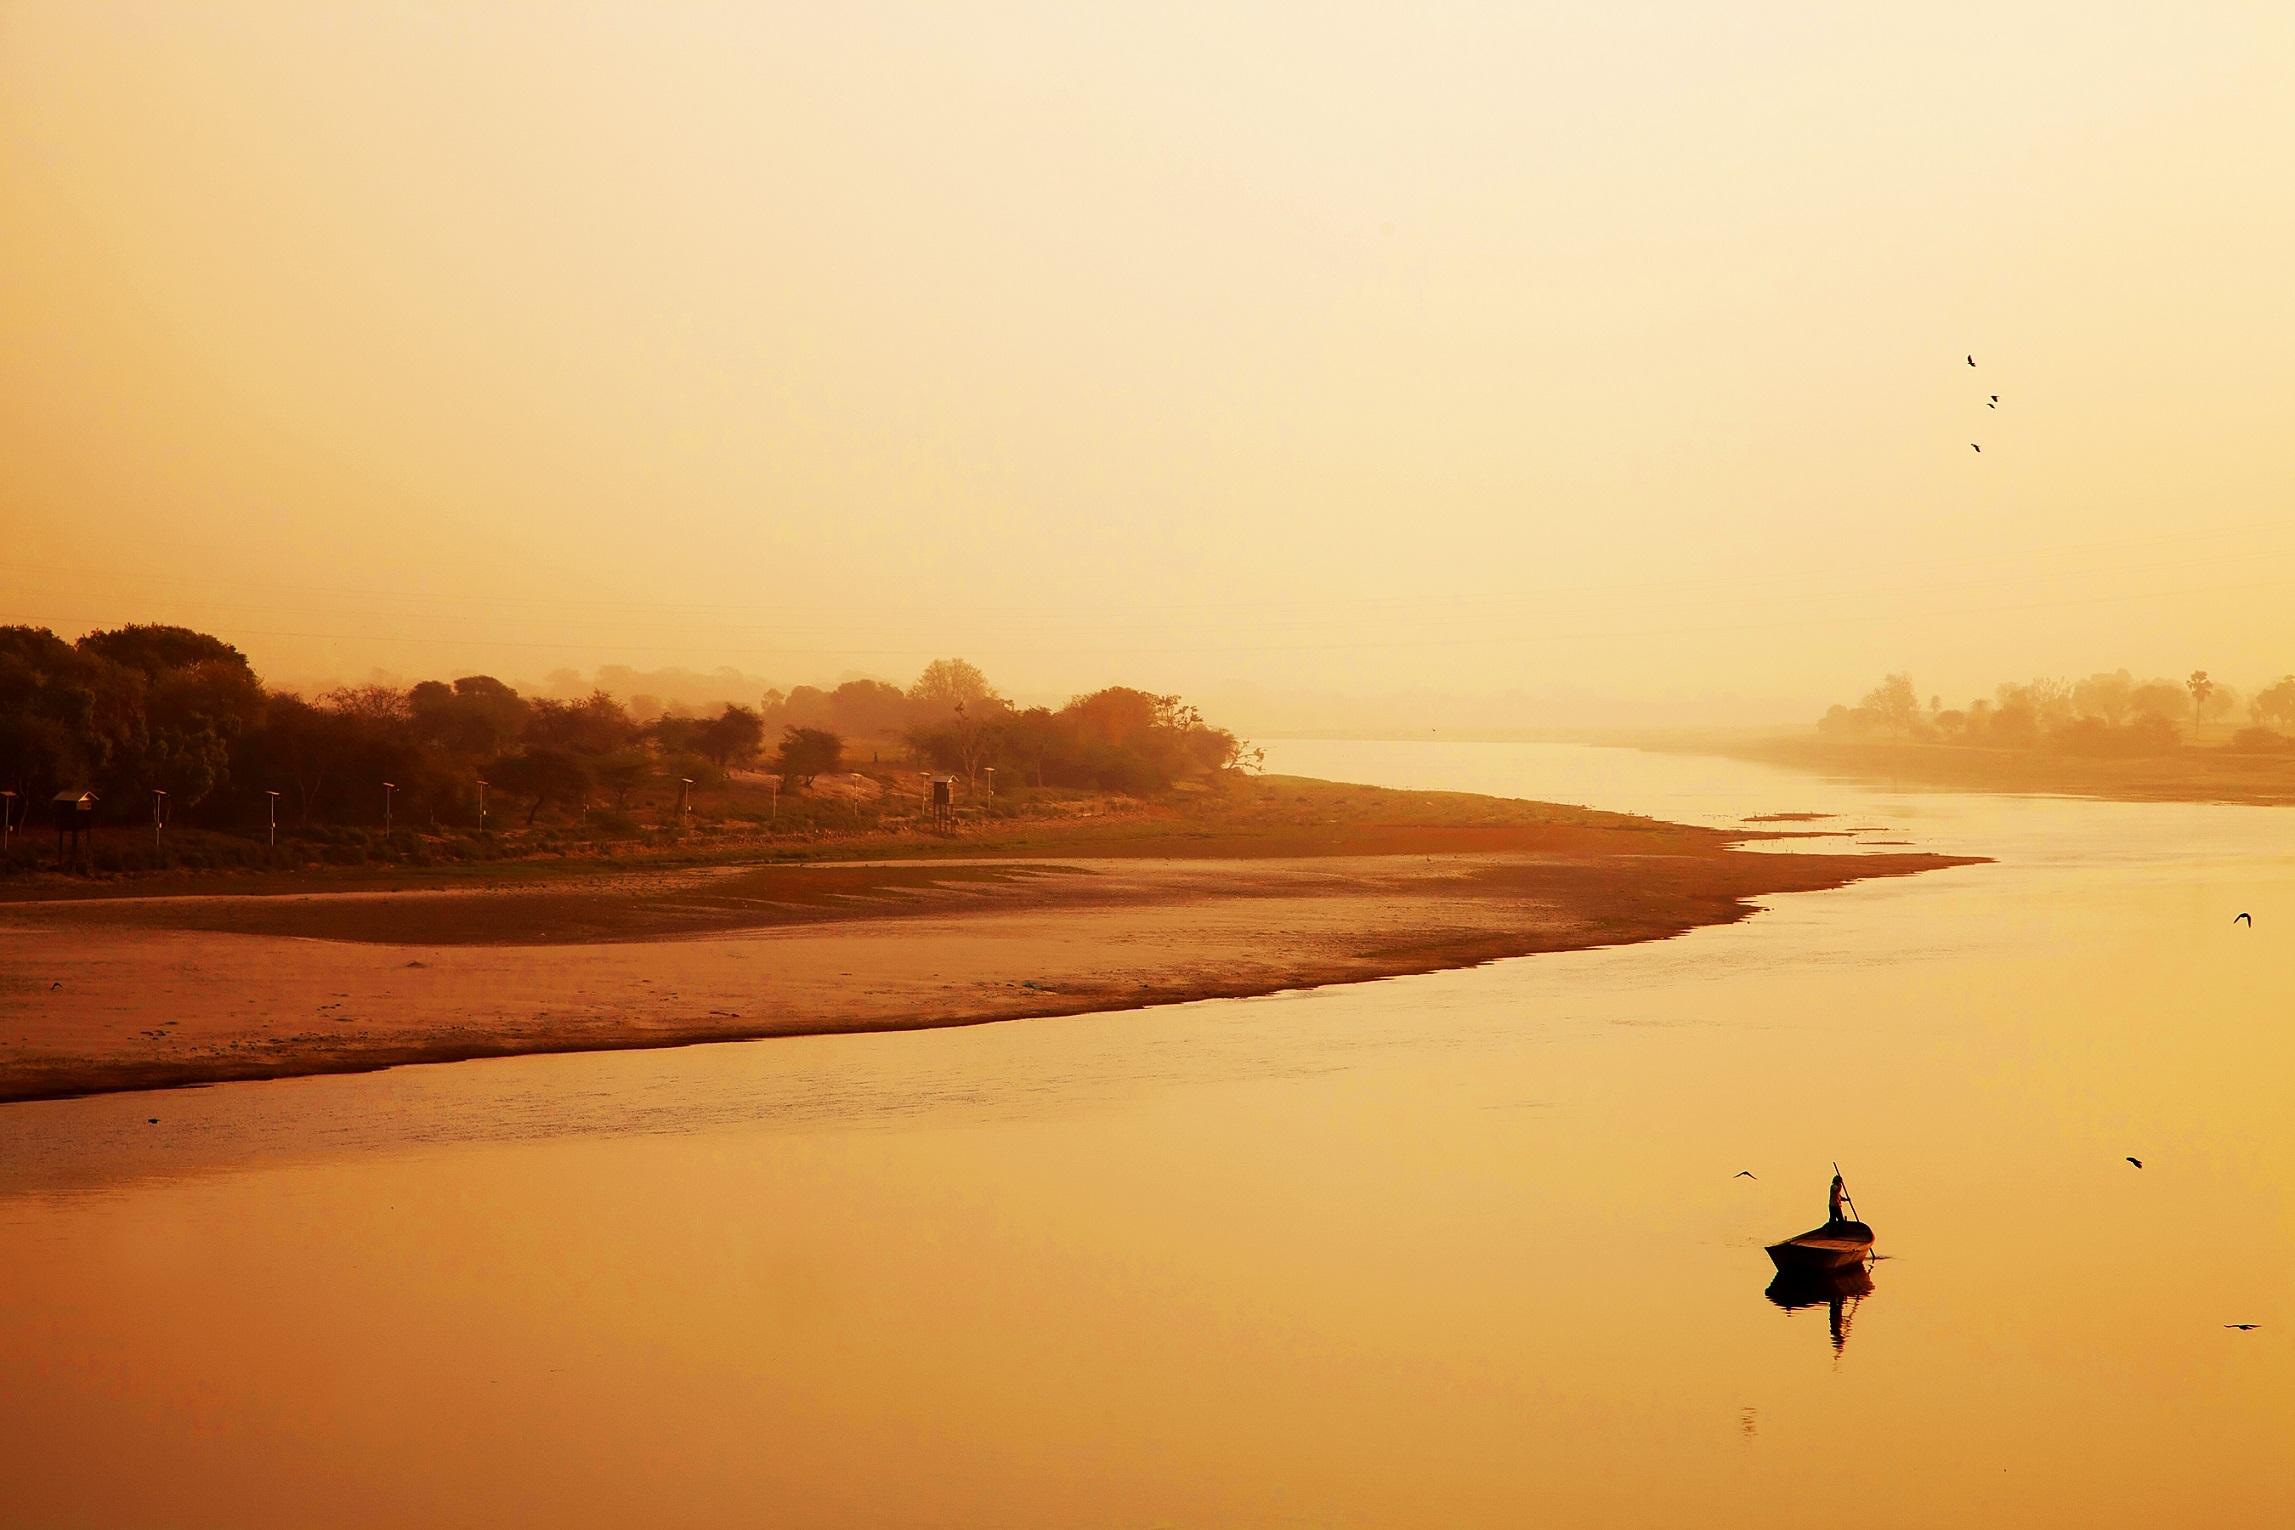 Yamuna: A Study of Its Links from the Sarasvati Findings- II